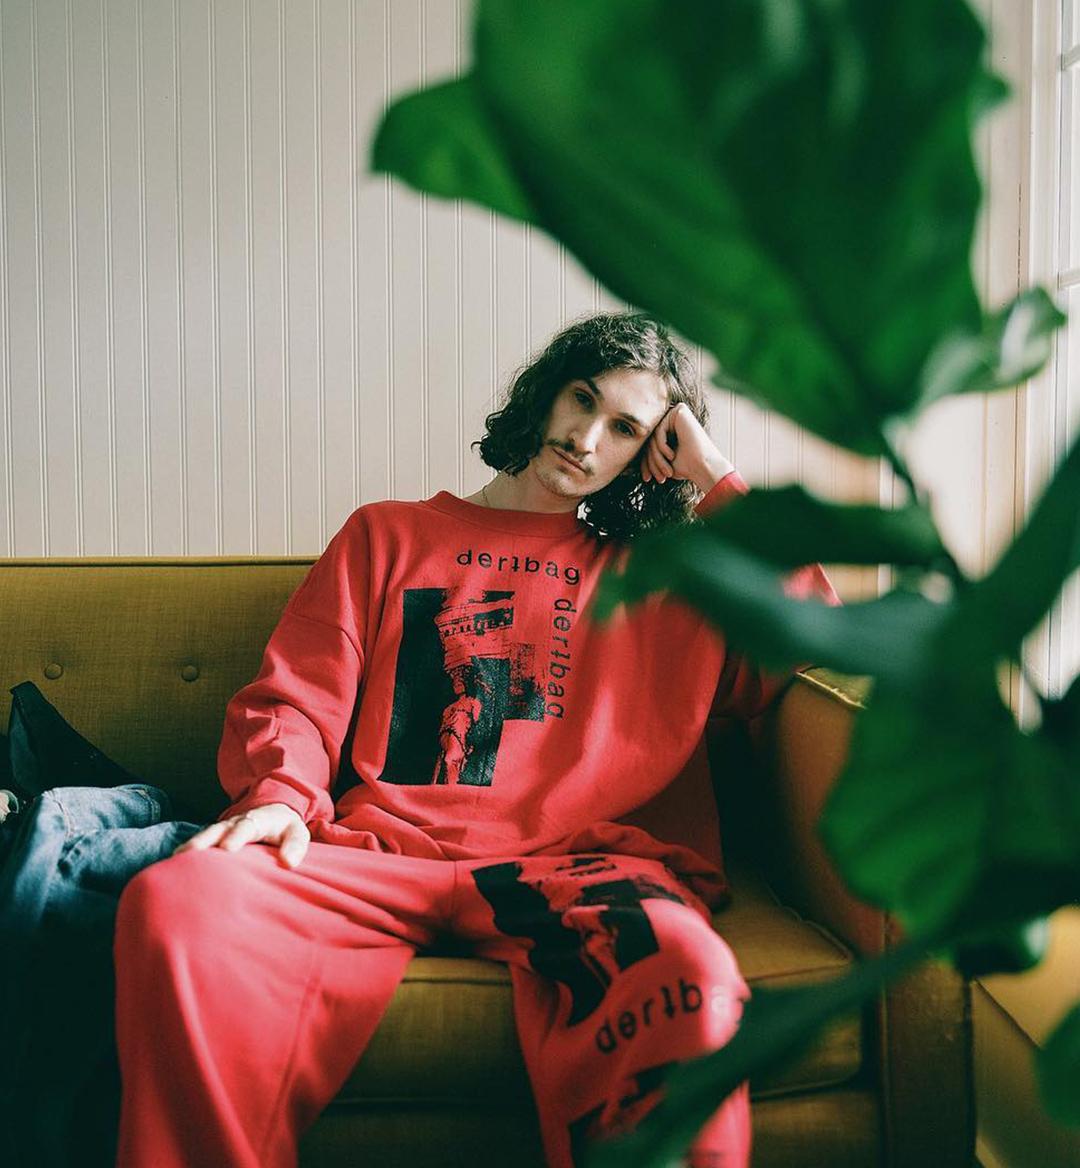 dertbag clothing philip post kanye interview mobile